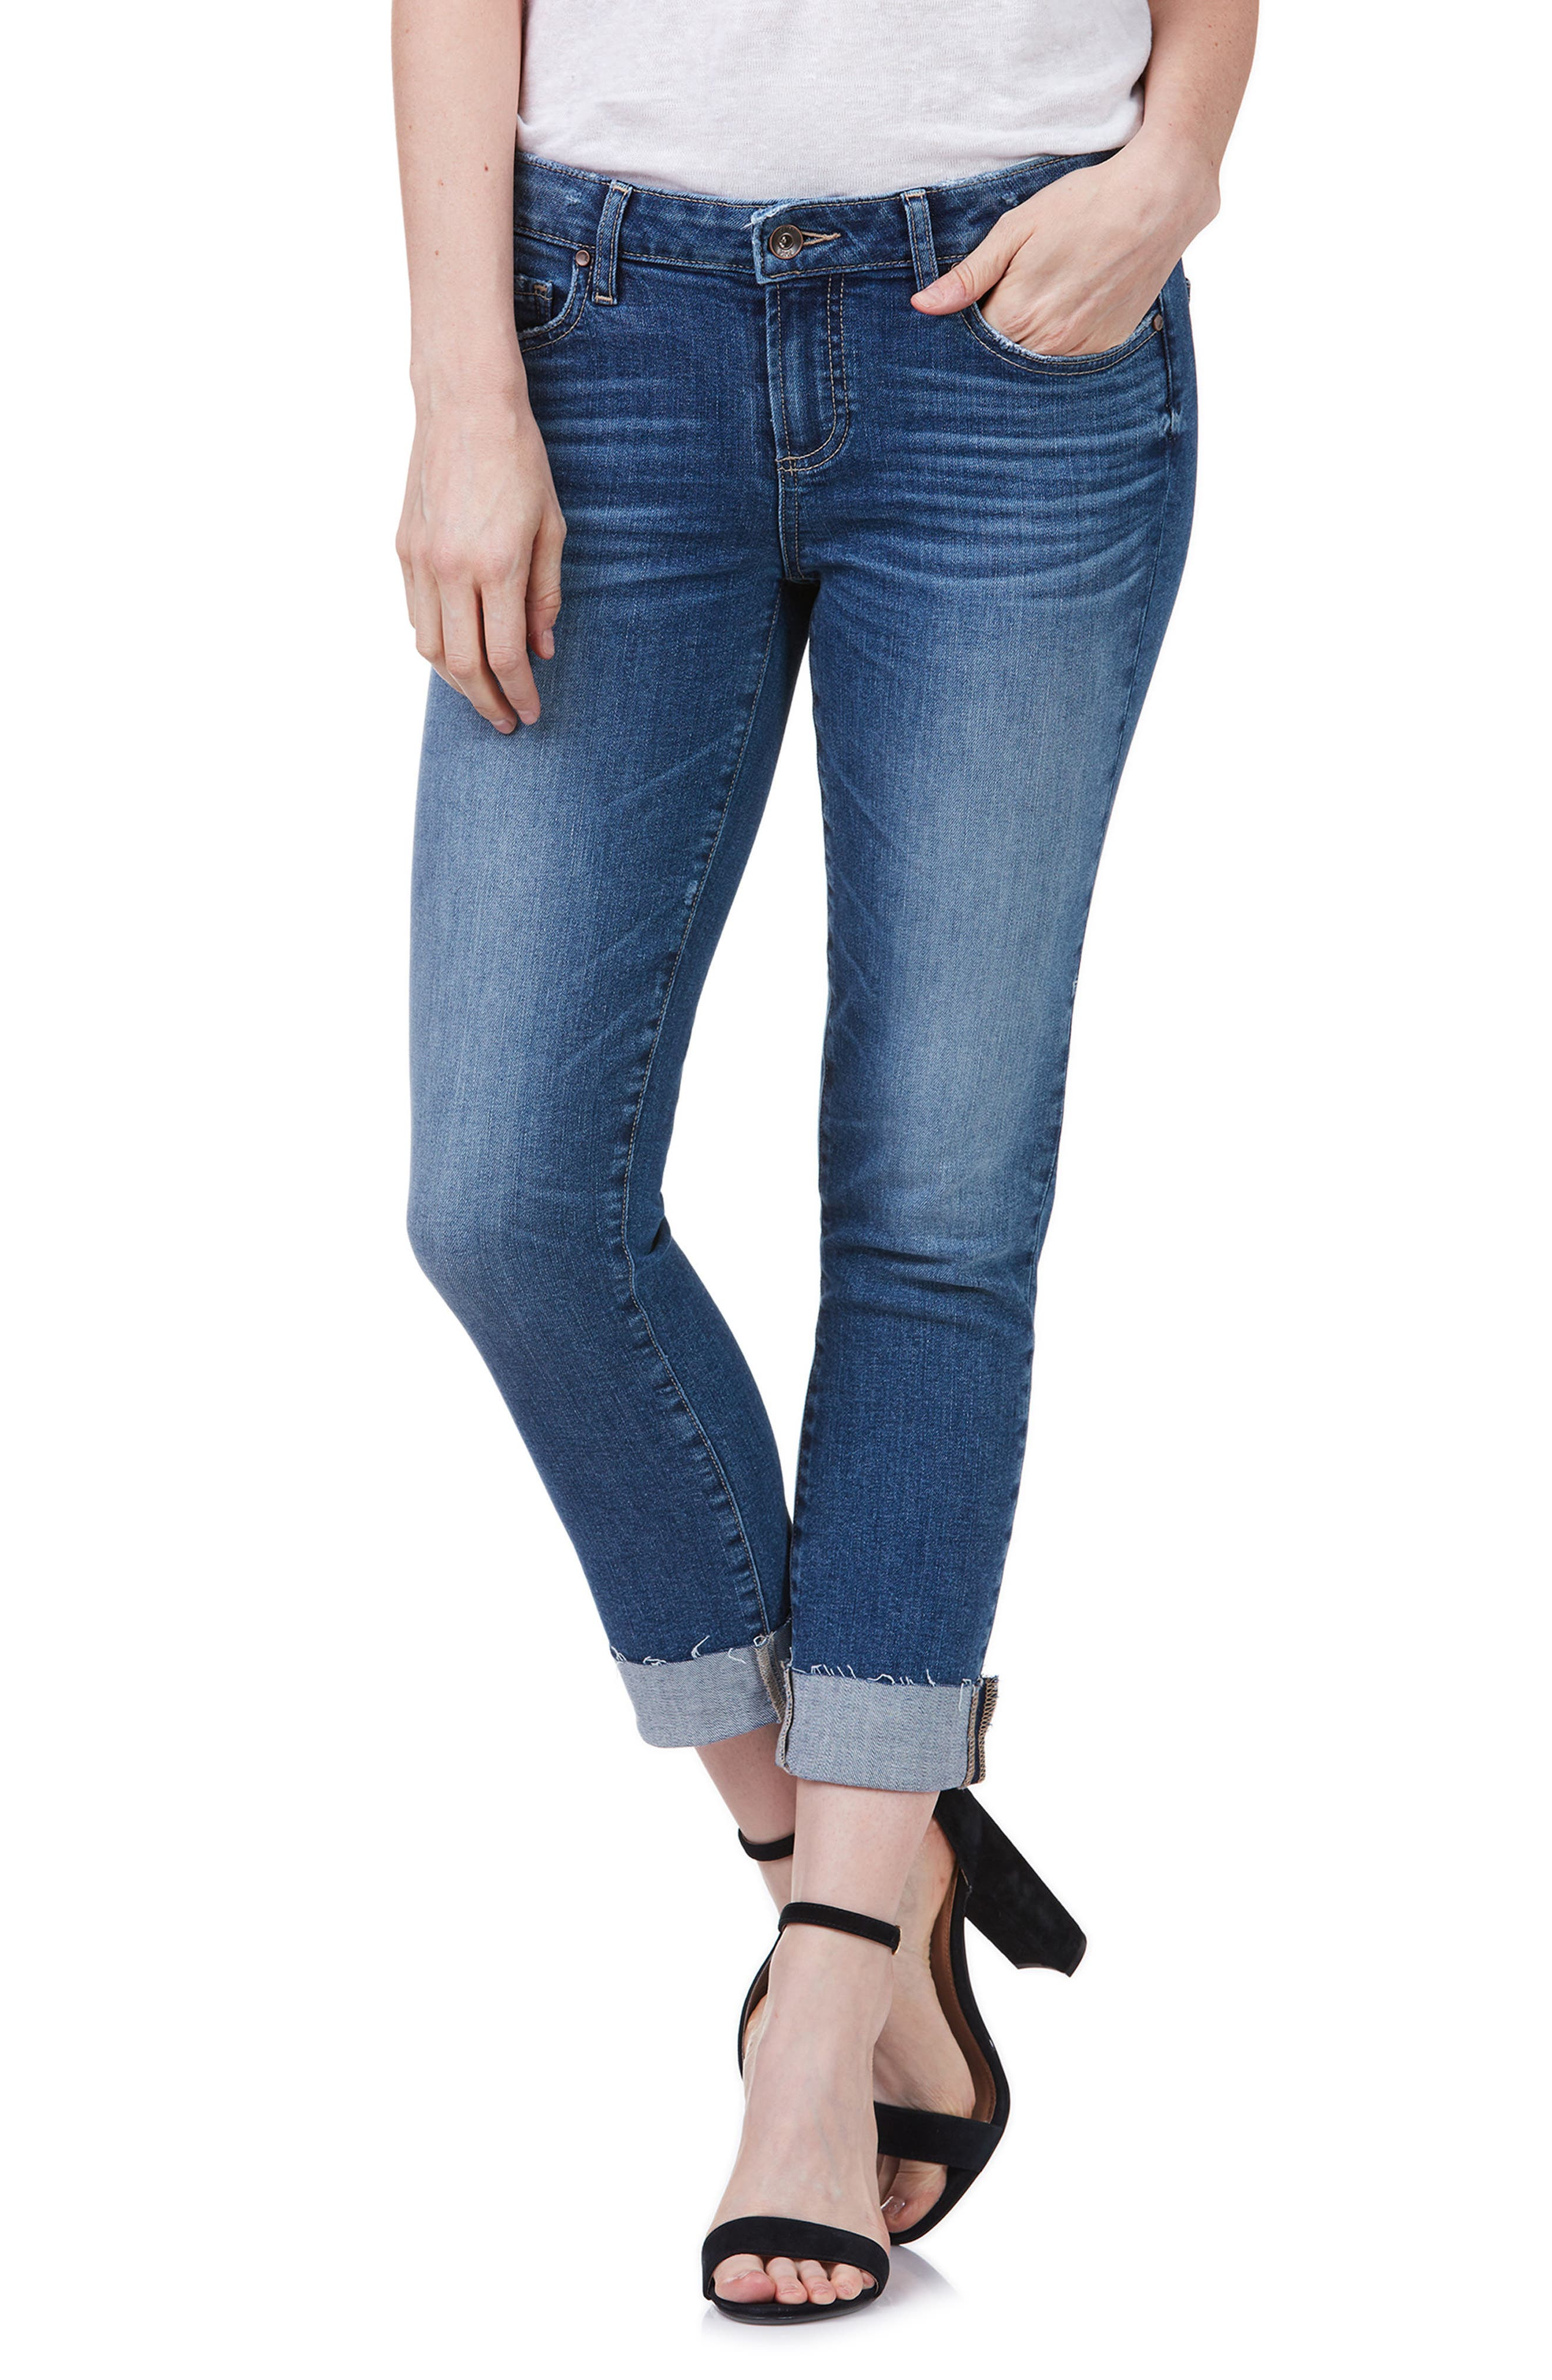 Main Image - PAIGE Transcend Vintage - Skyline Crop Skinny Jeans (Pico)